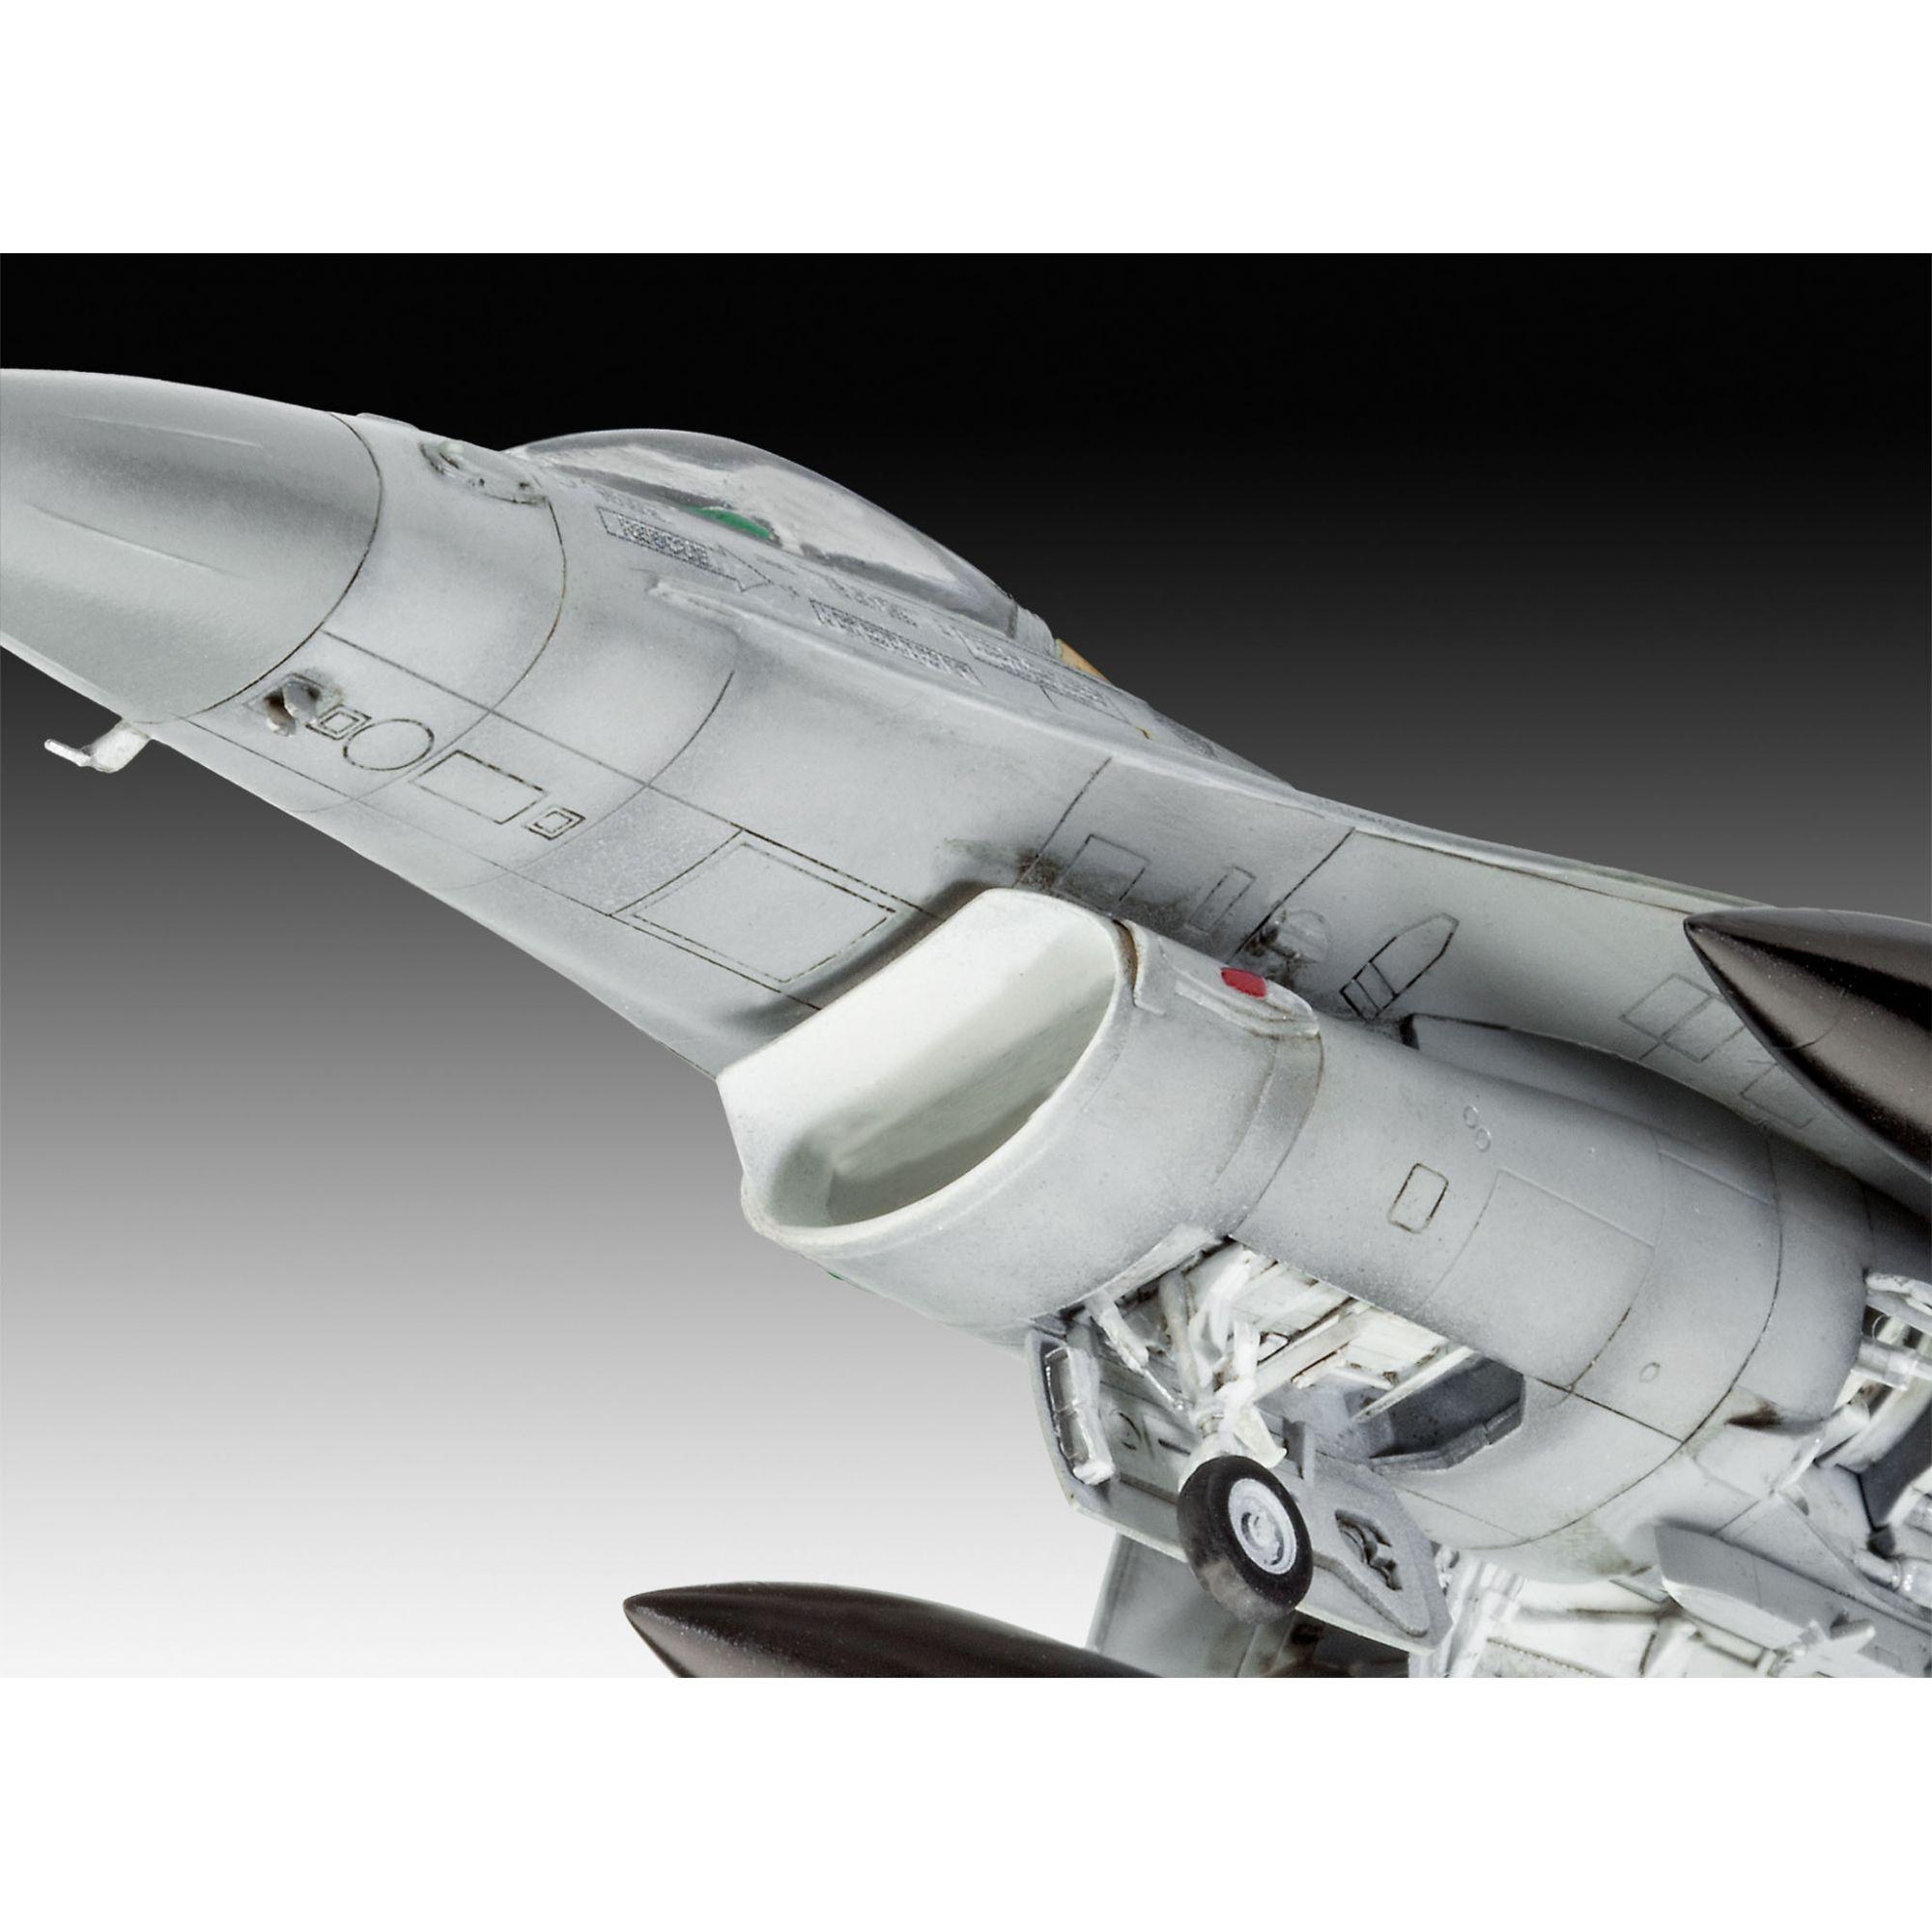 Lockheed Martin F-16 MLU - 1/72 - Revell 03905  - BLIMPS COMÉRCIO ELETRÔNICO